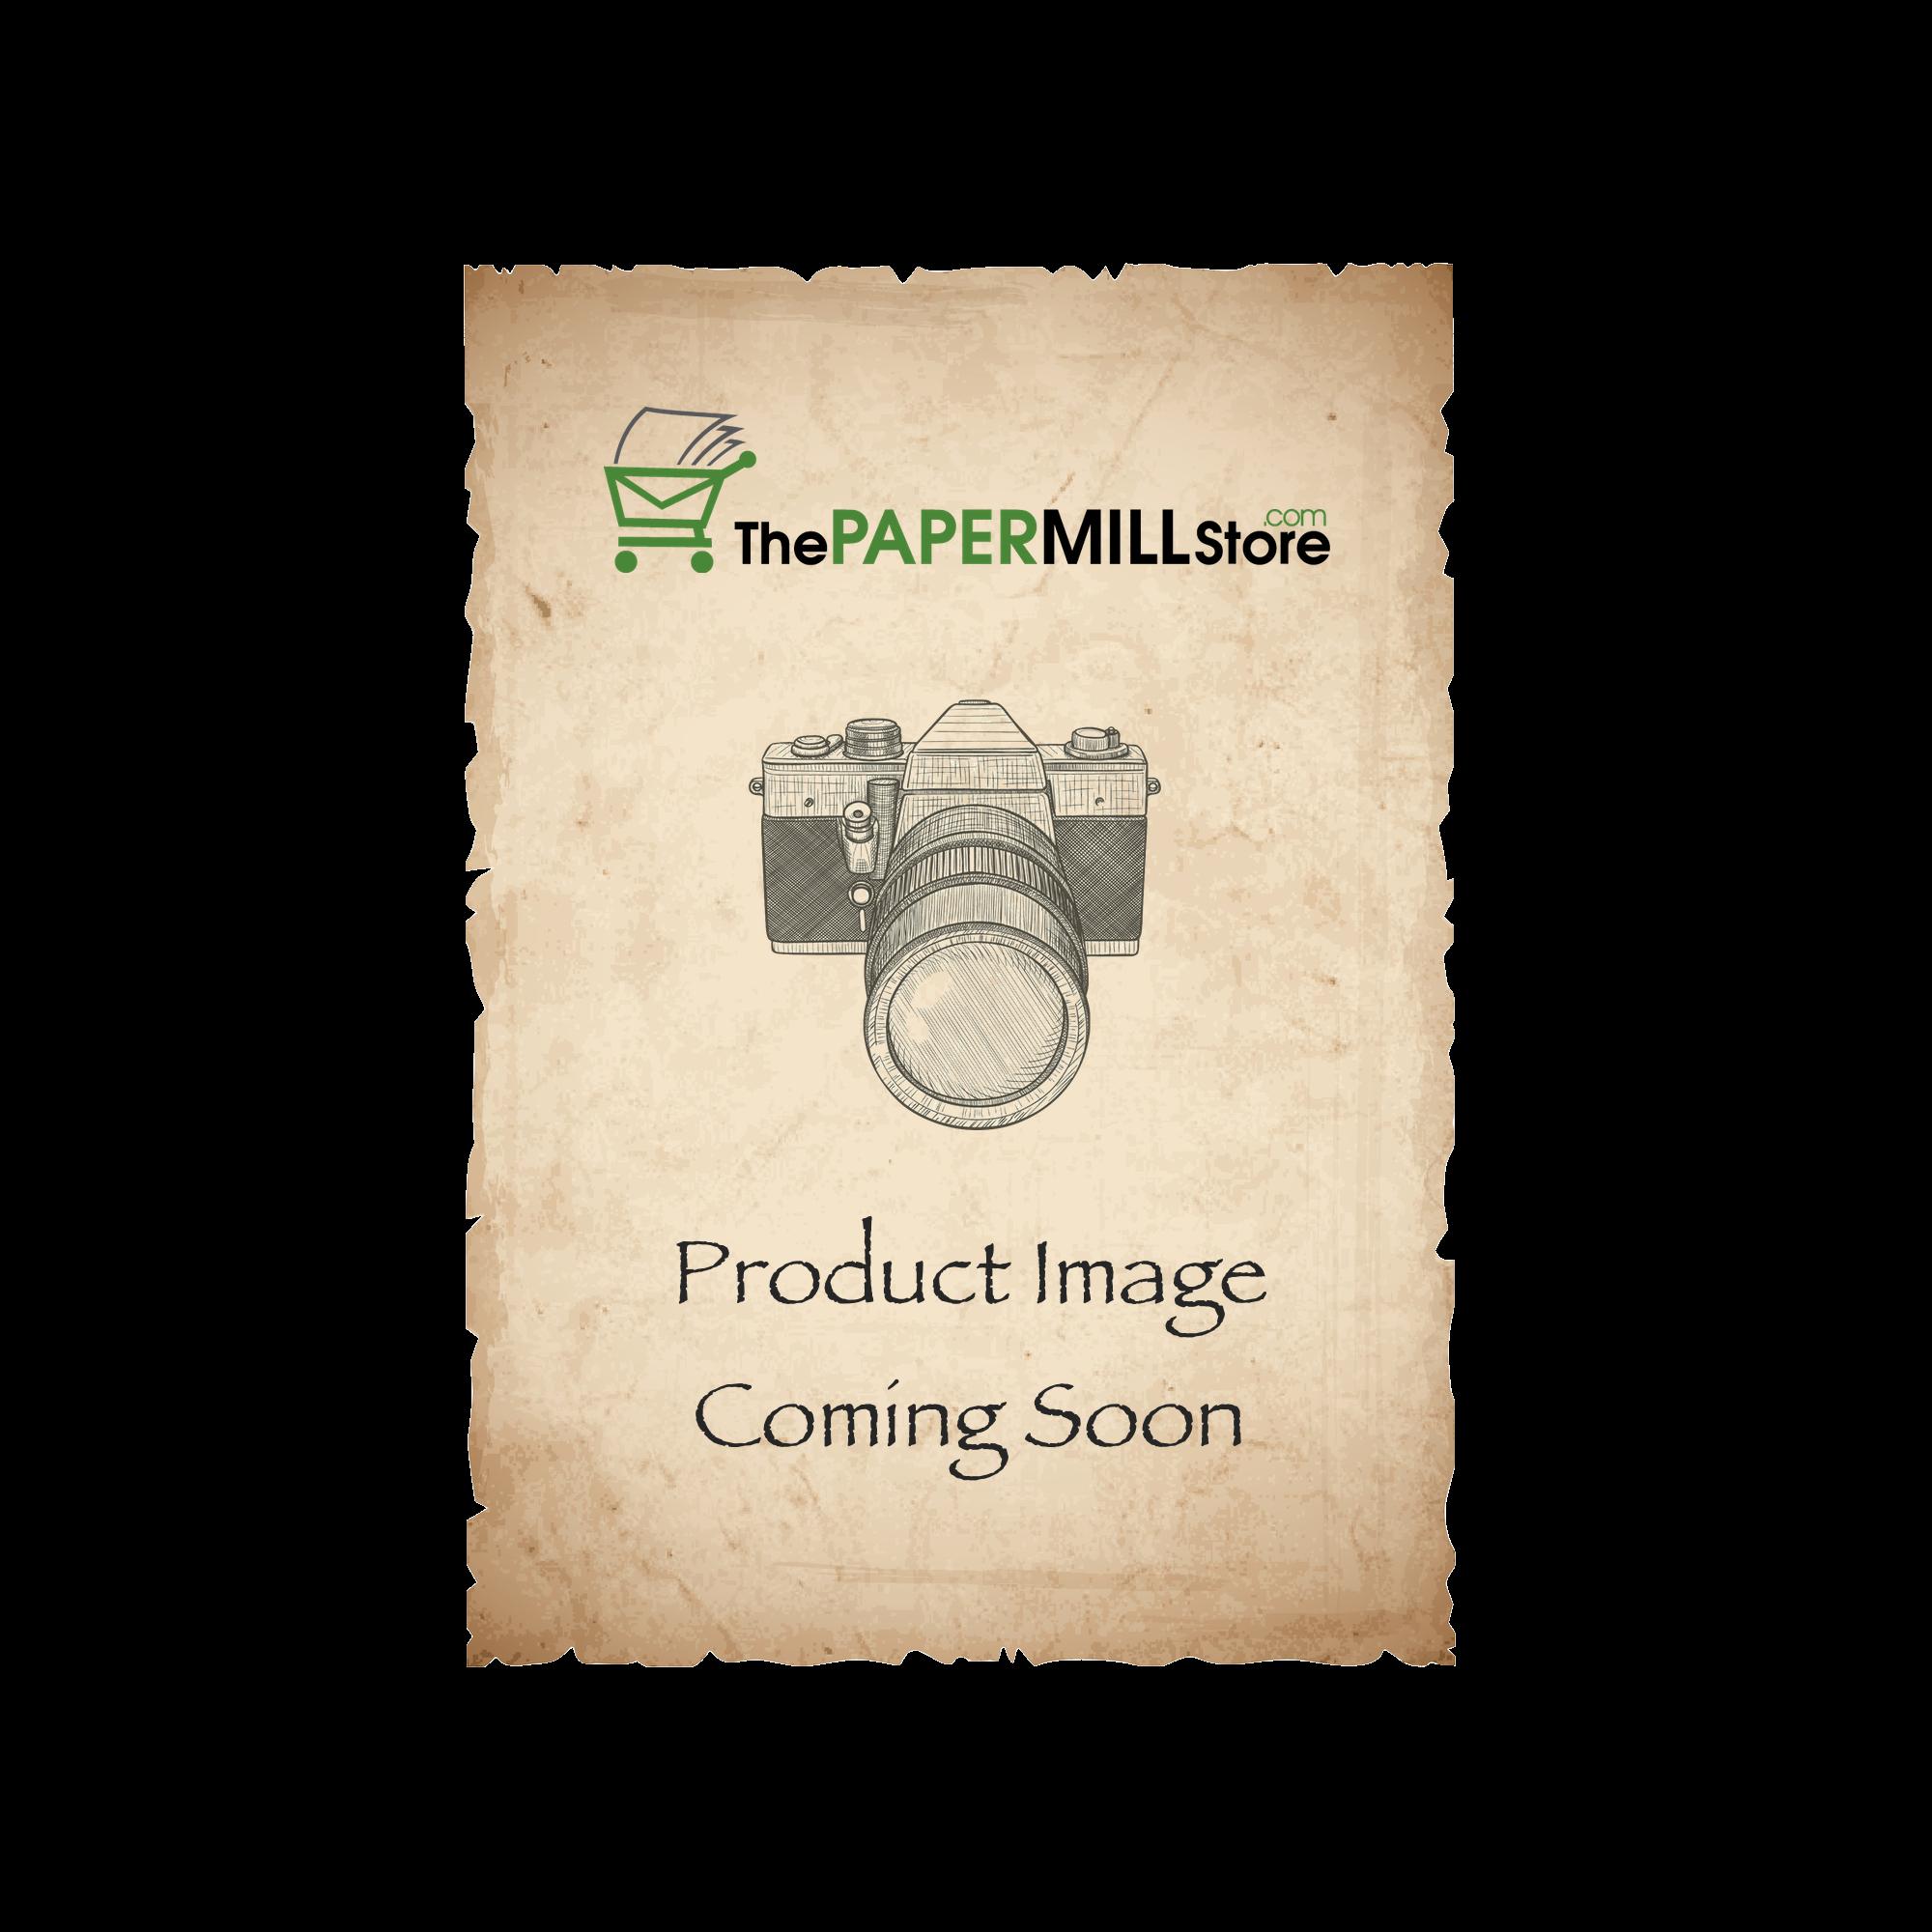 Buy Via Felt Natural Card Stock - 26 x 40 in 110 lb Cover Felt  30% Recycled 300 per Carton at The Paper Mill Store .com